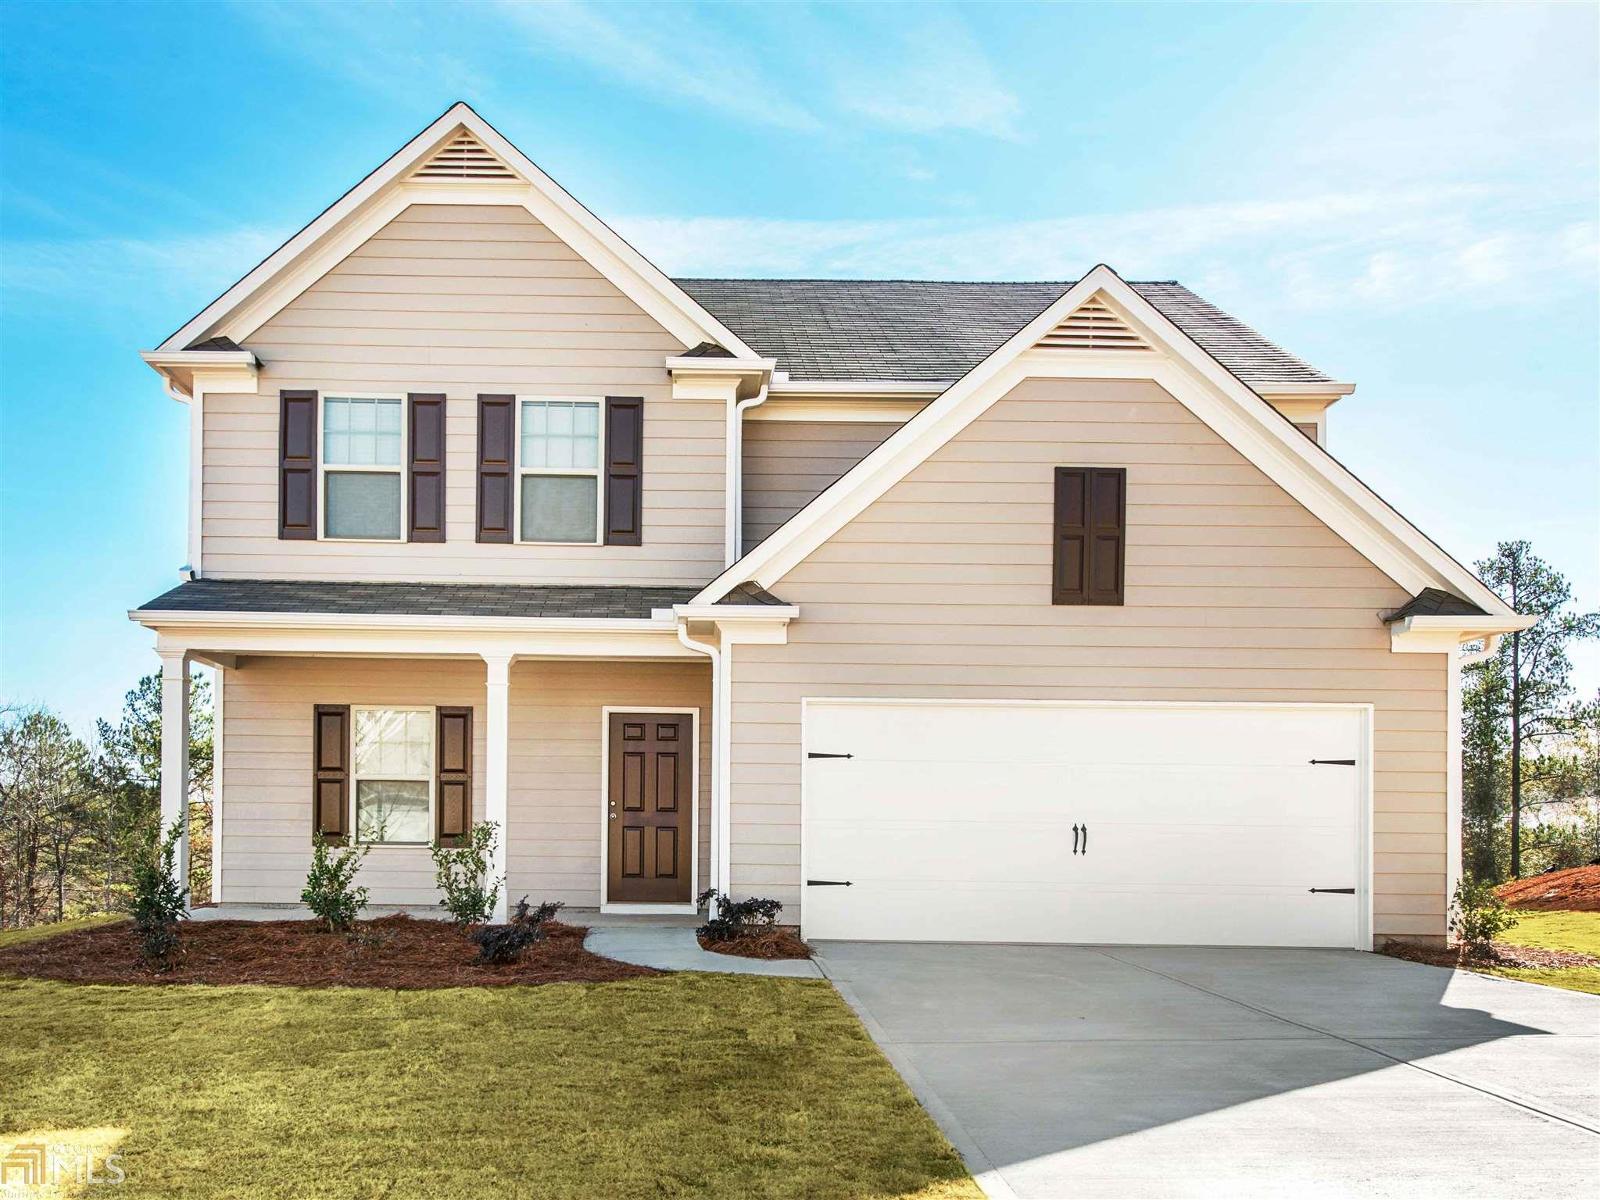 Local Real Estate Homes for Sale Winder GA Coldwell Banker